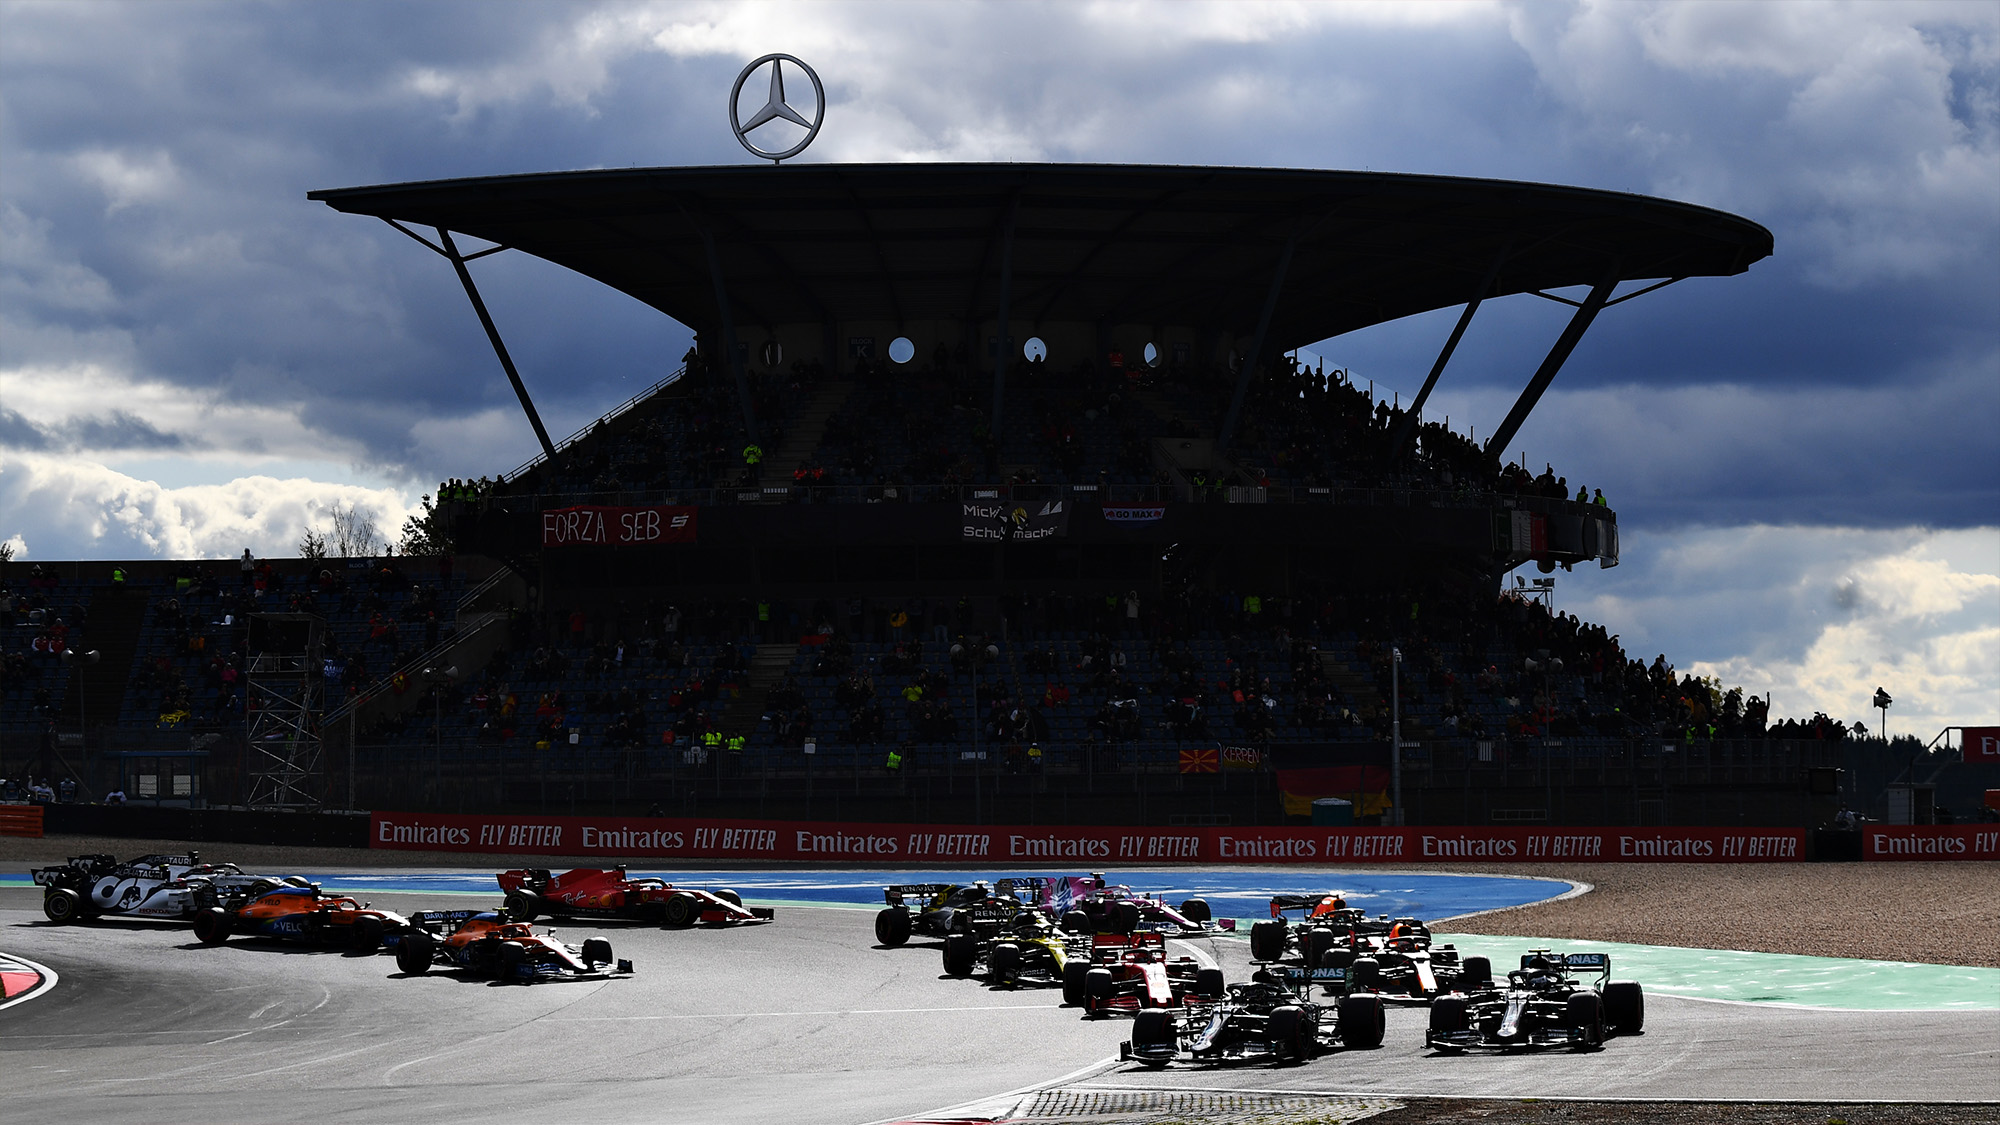 Lewis Hamilton and Valtteri Bottas battle for the lead of the 2020 F1 Eifel Grand Prix at the Nurbirgring